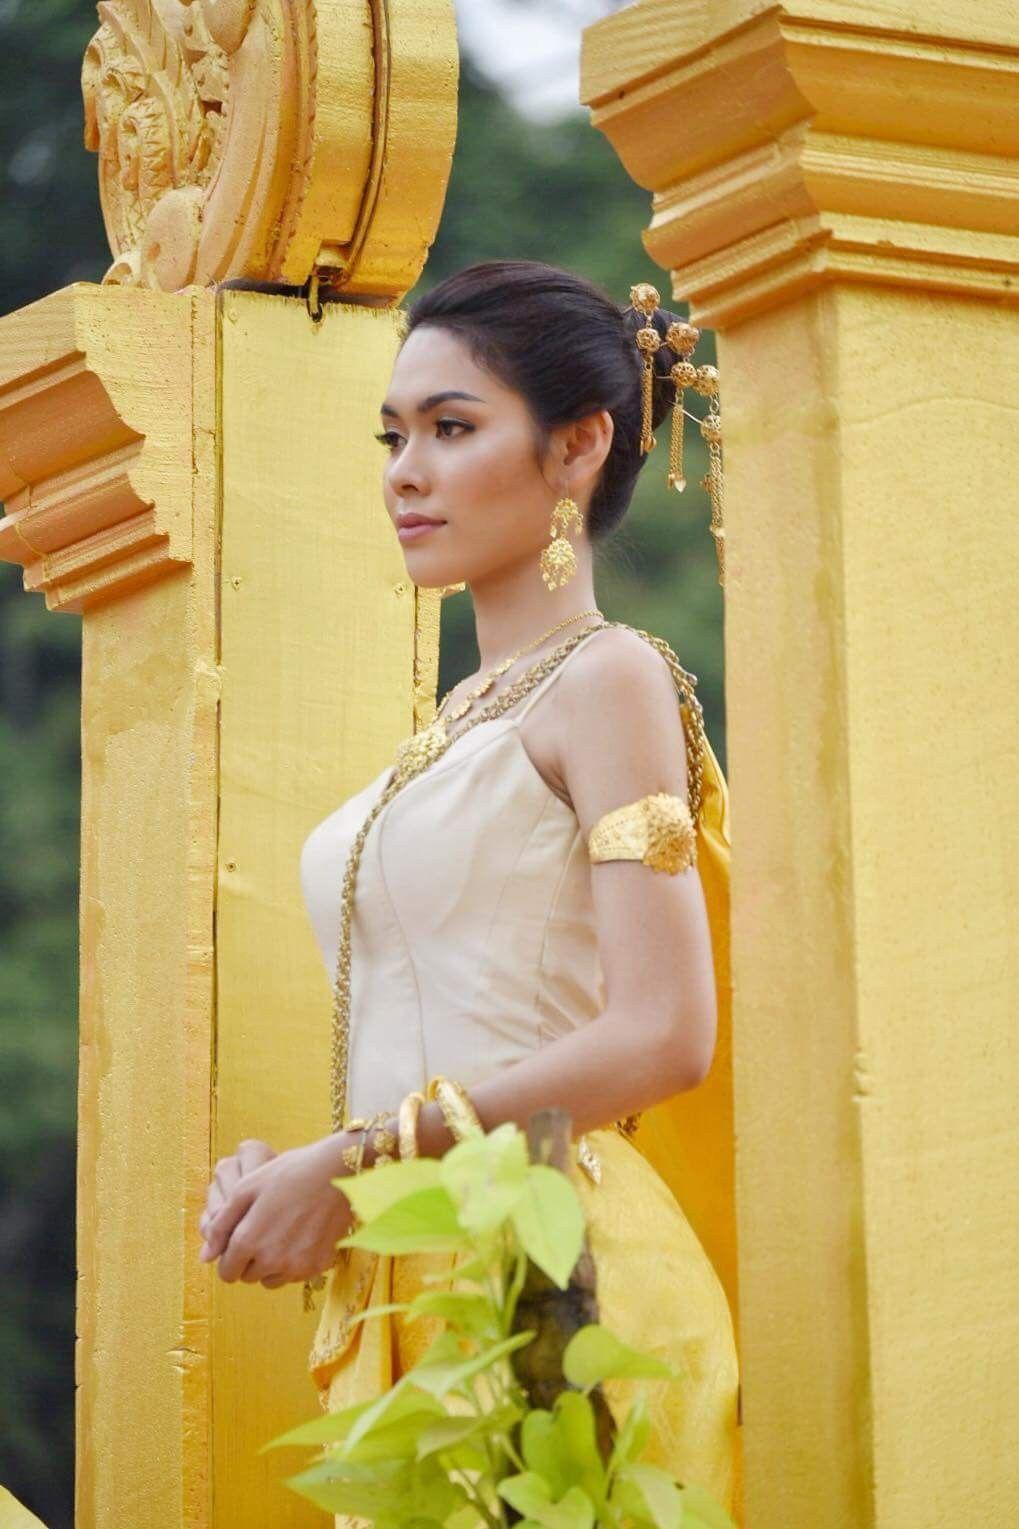 Pin by sokay tuy on khmer culture fashion u dance in